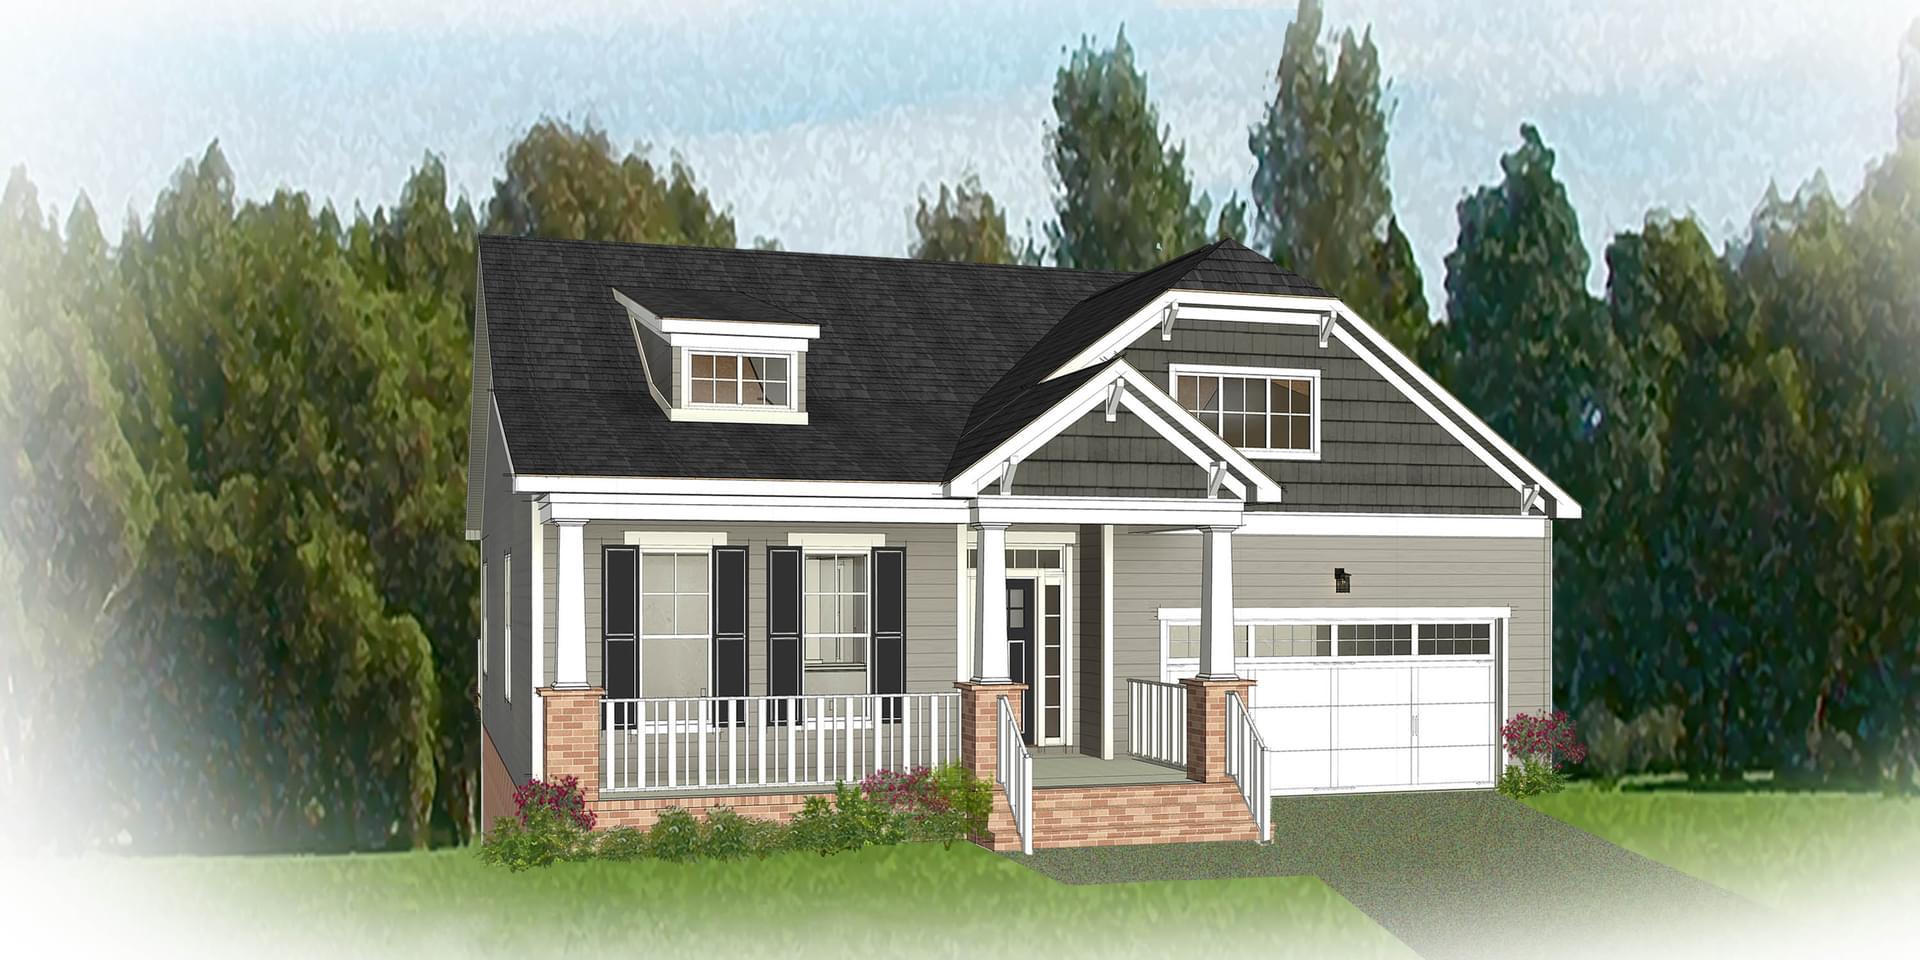 The Hartford Terrace New Home Floorplan